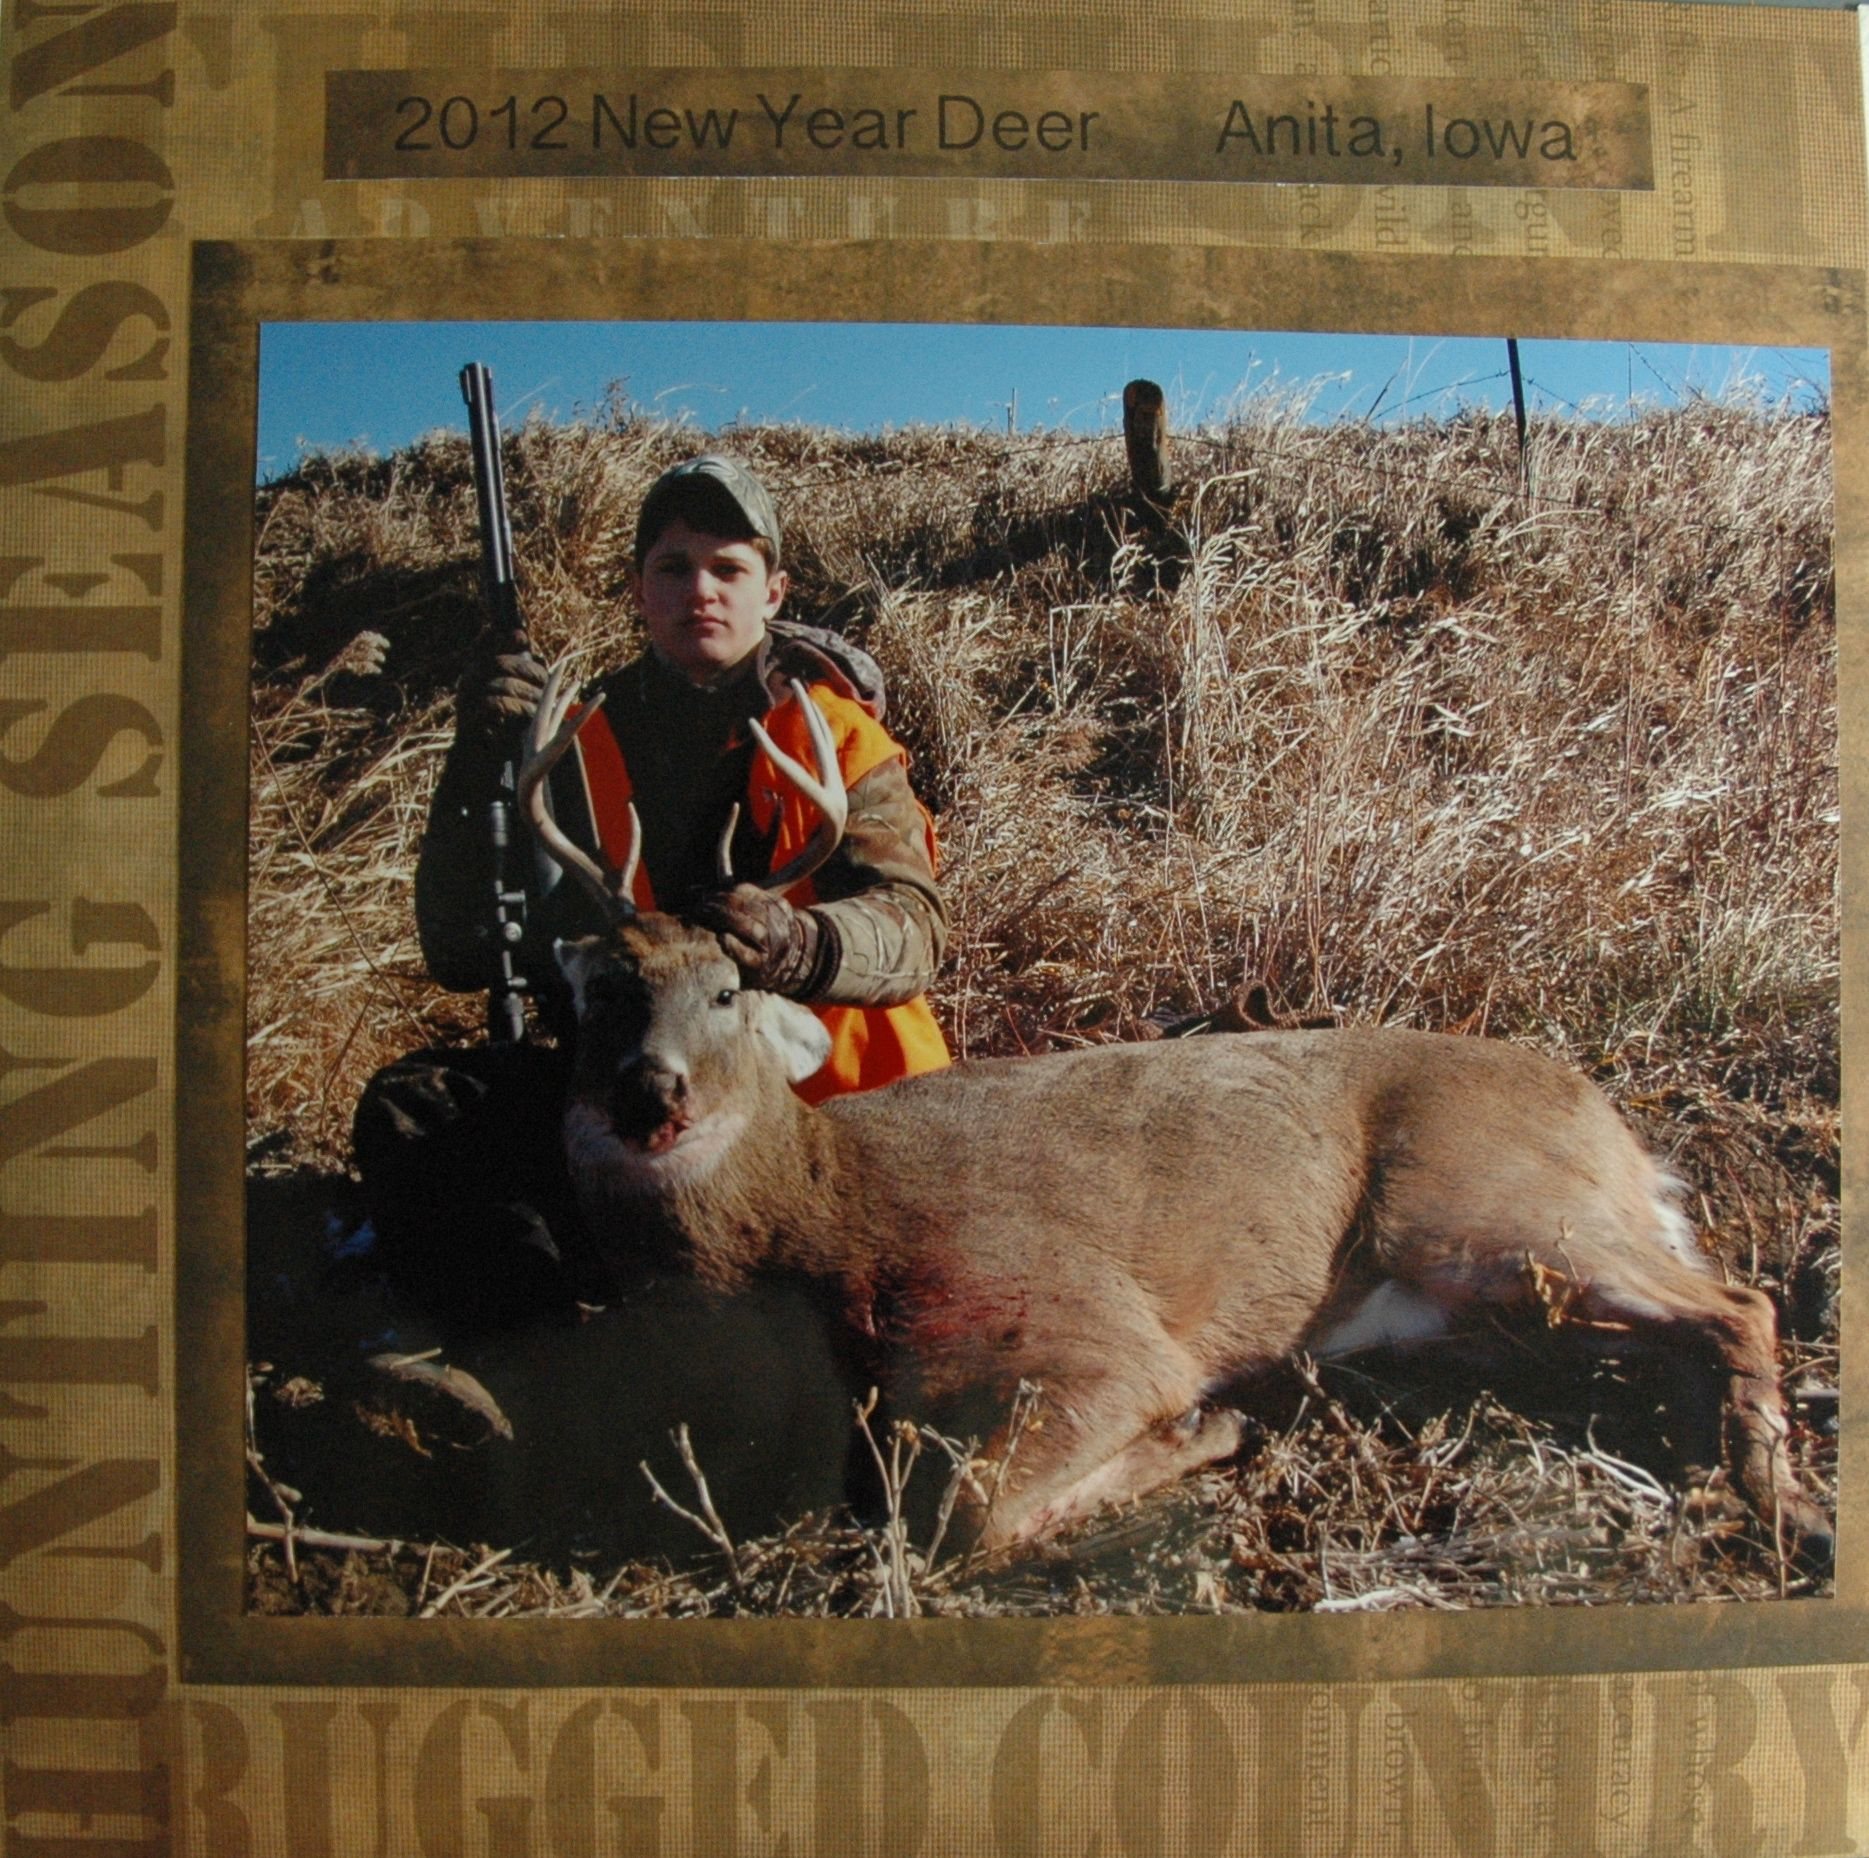 Scrapbooking Hunting New Year Deer 2012 Scrapbooking